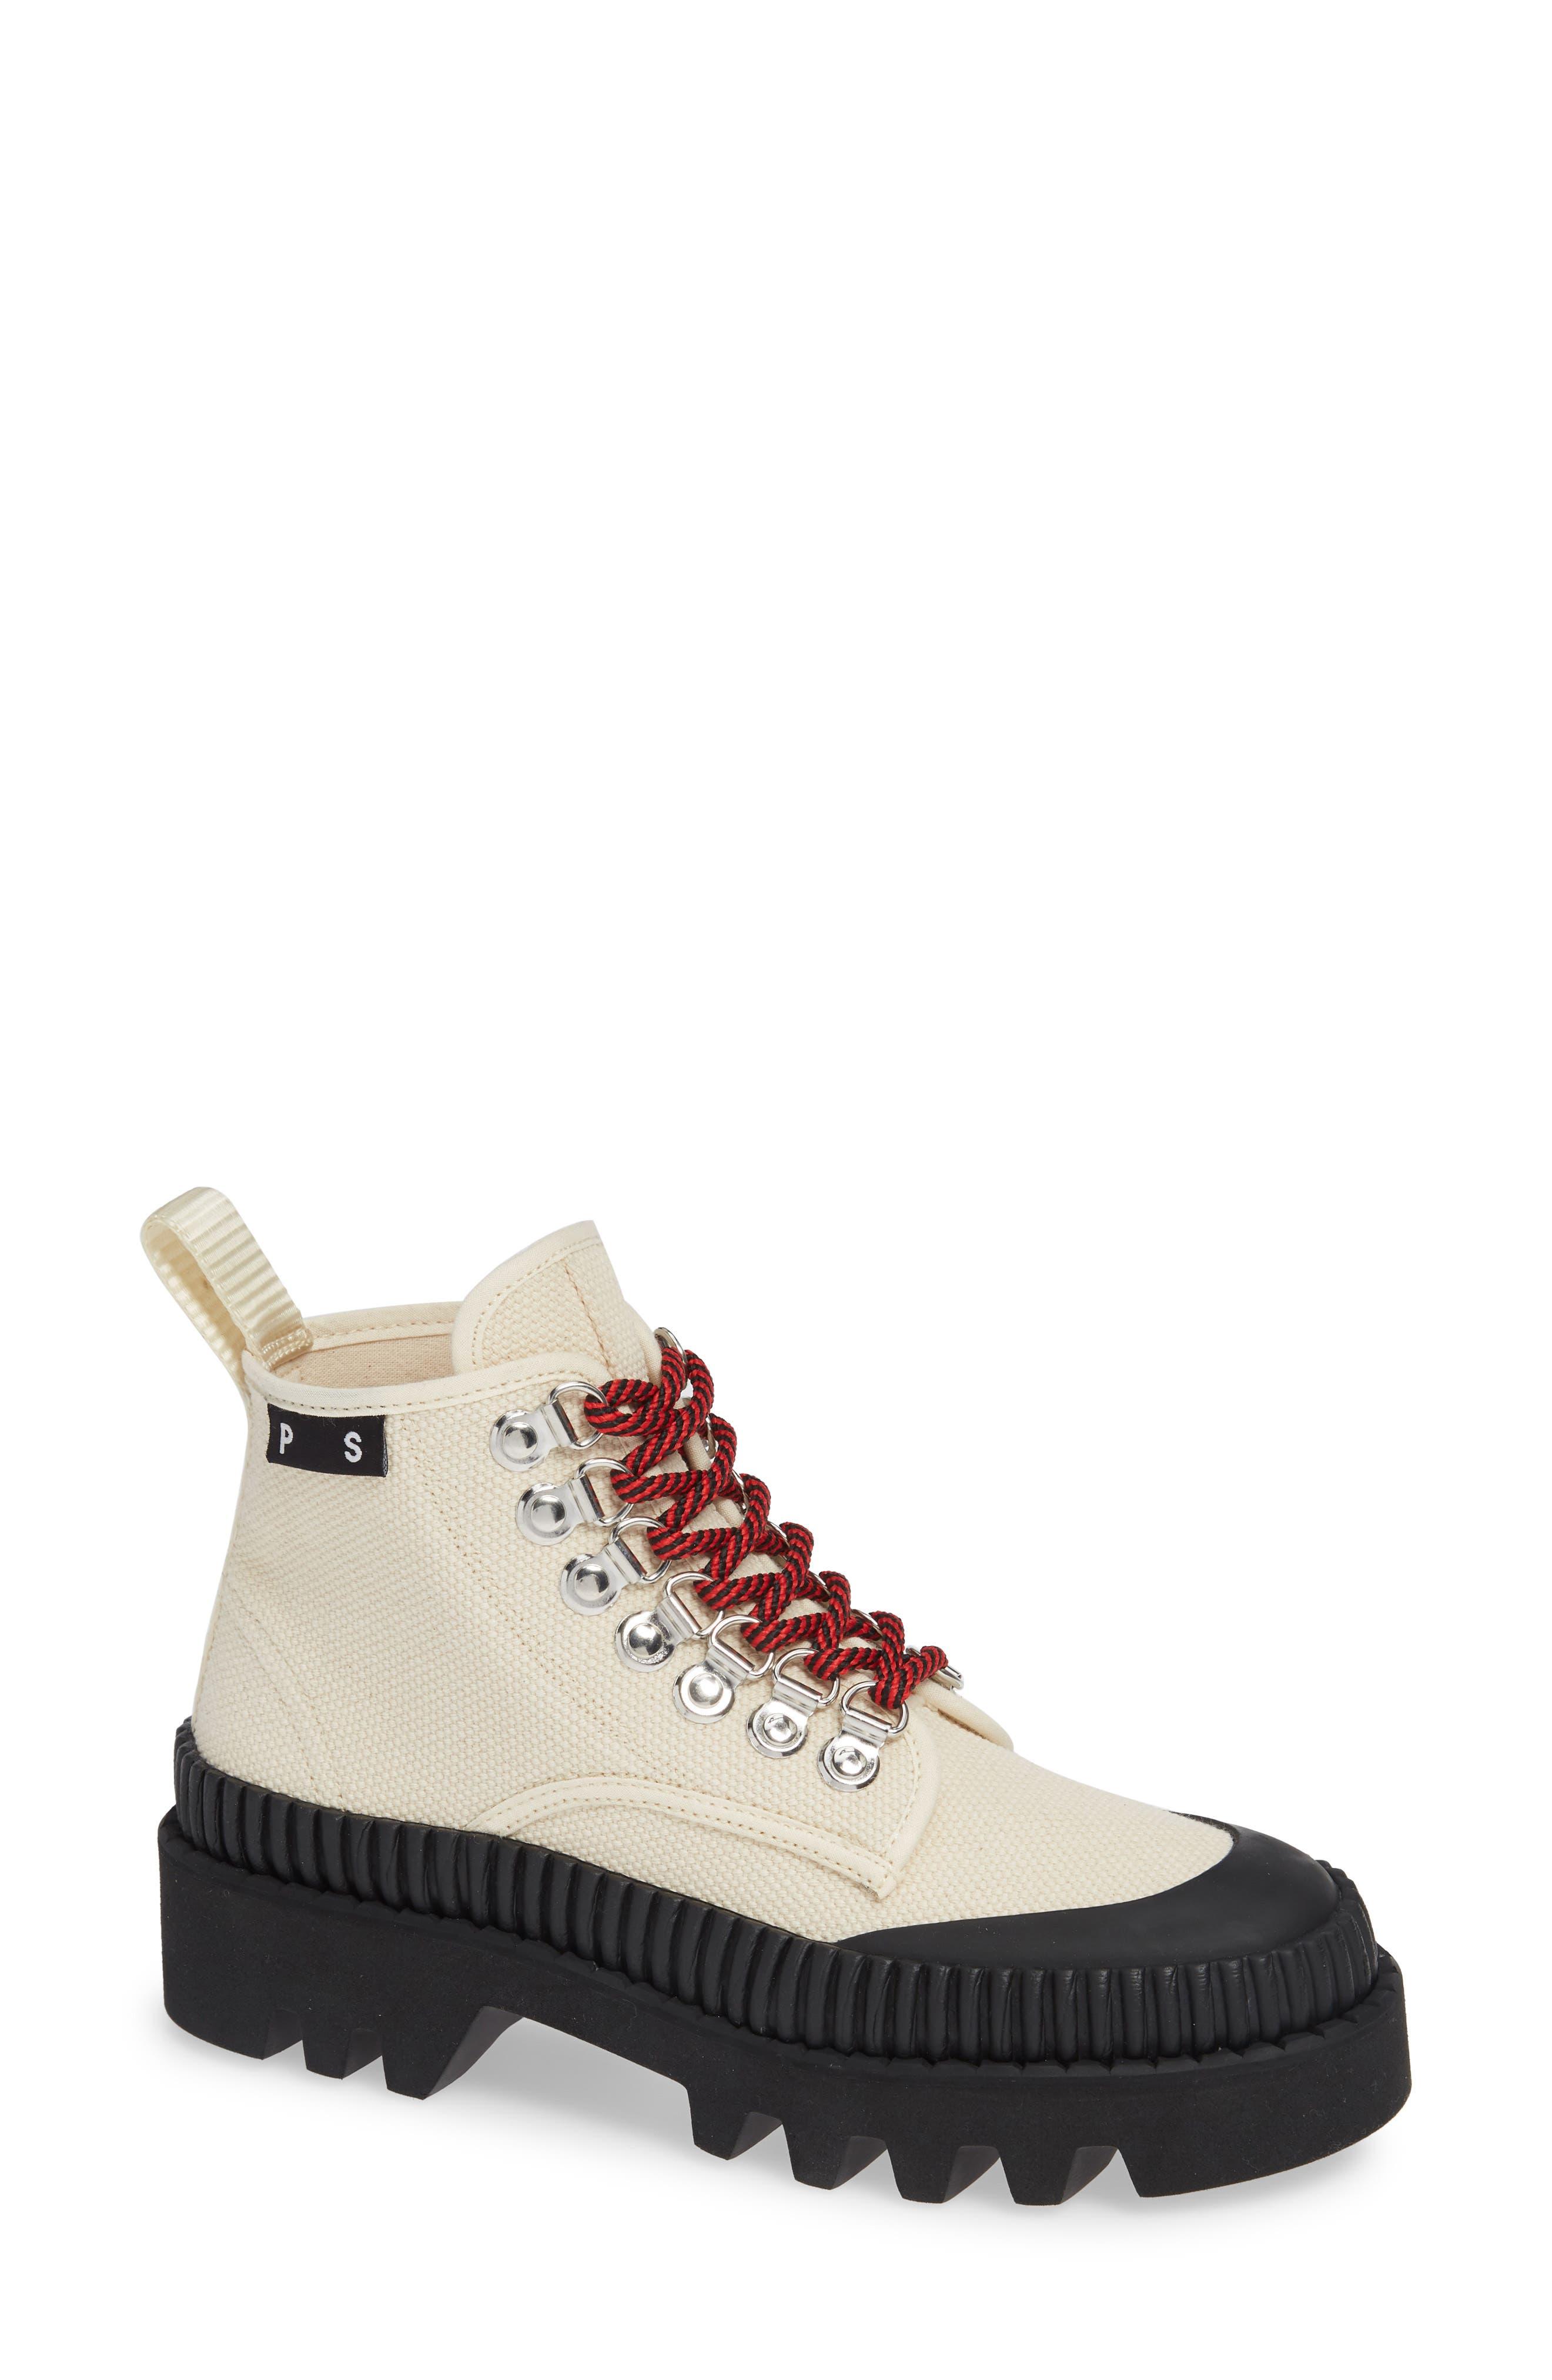 PROENZA SCHOULER Hiker Boot, Main, color, ECRU/ BLACK